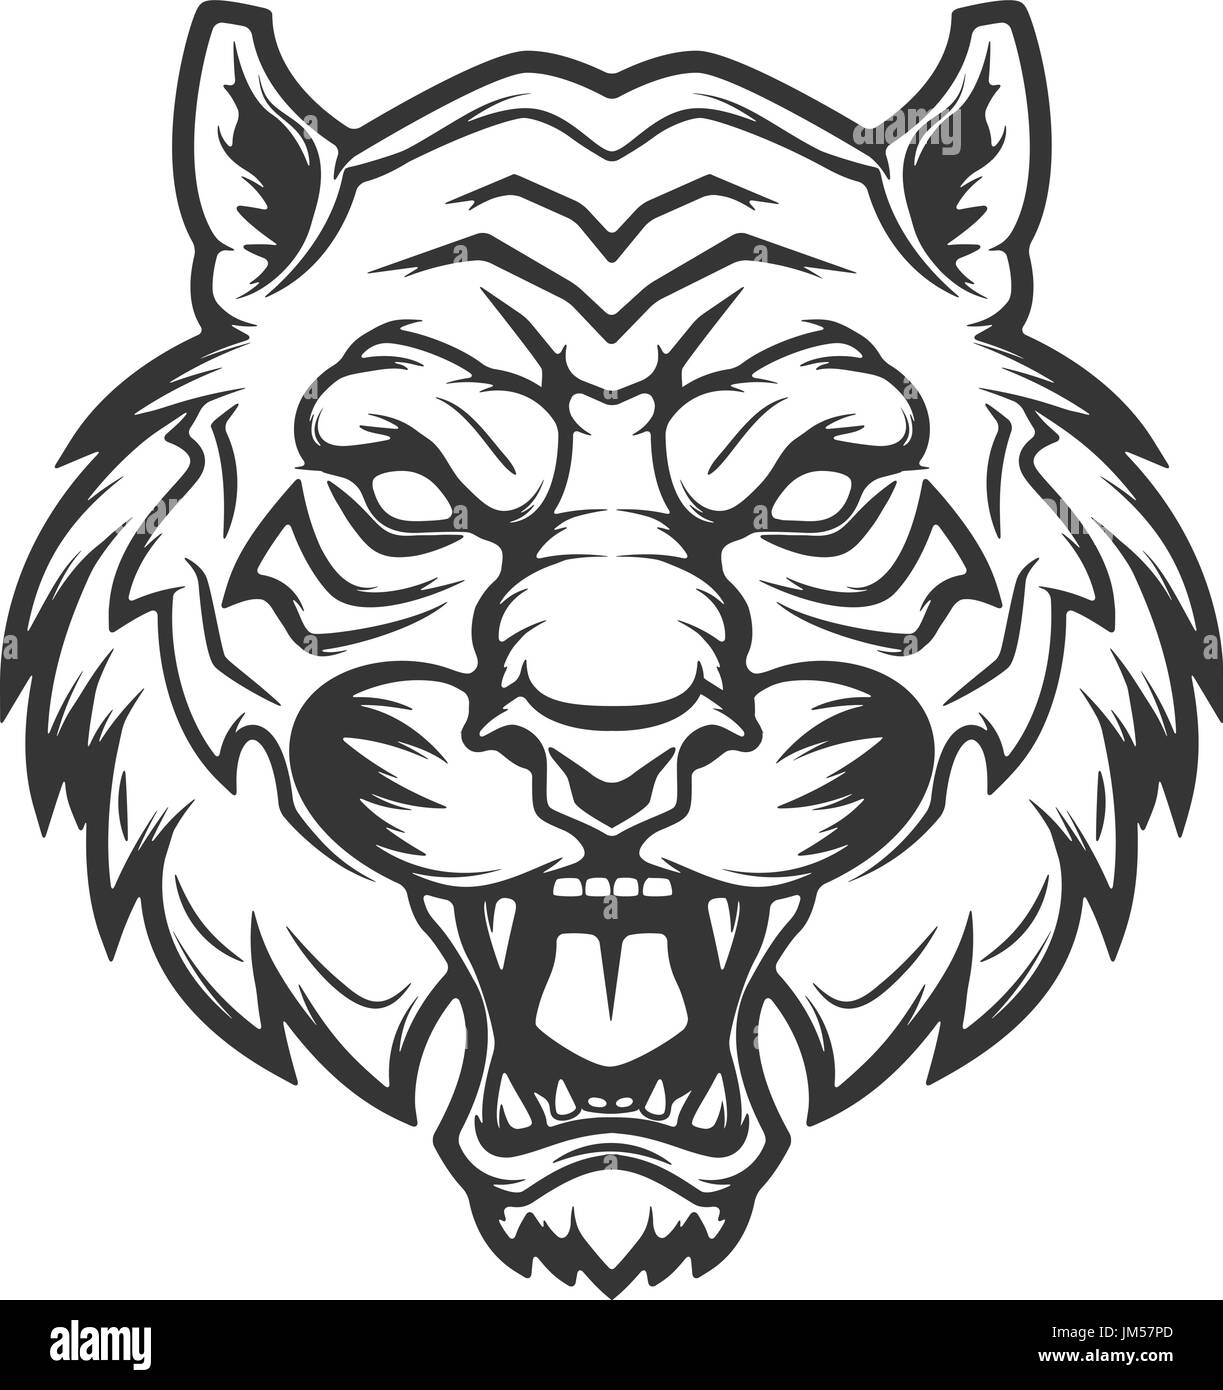 tiger head illustration isolated on white background. Images for logo, label, emblem. Vector illustration. - Stock Image